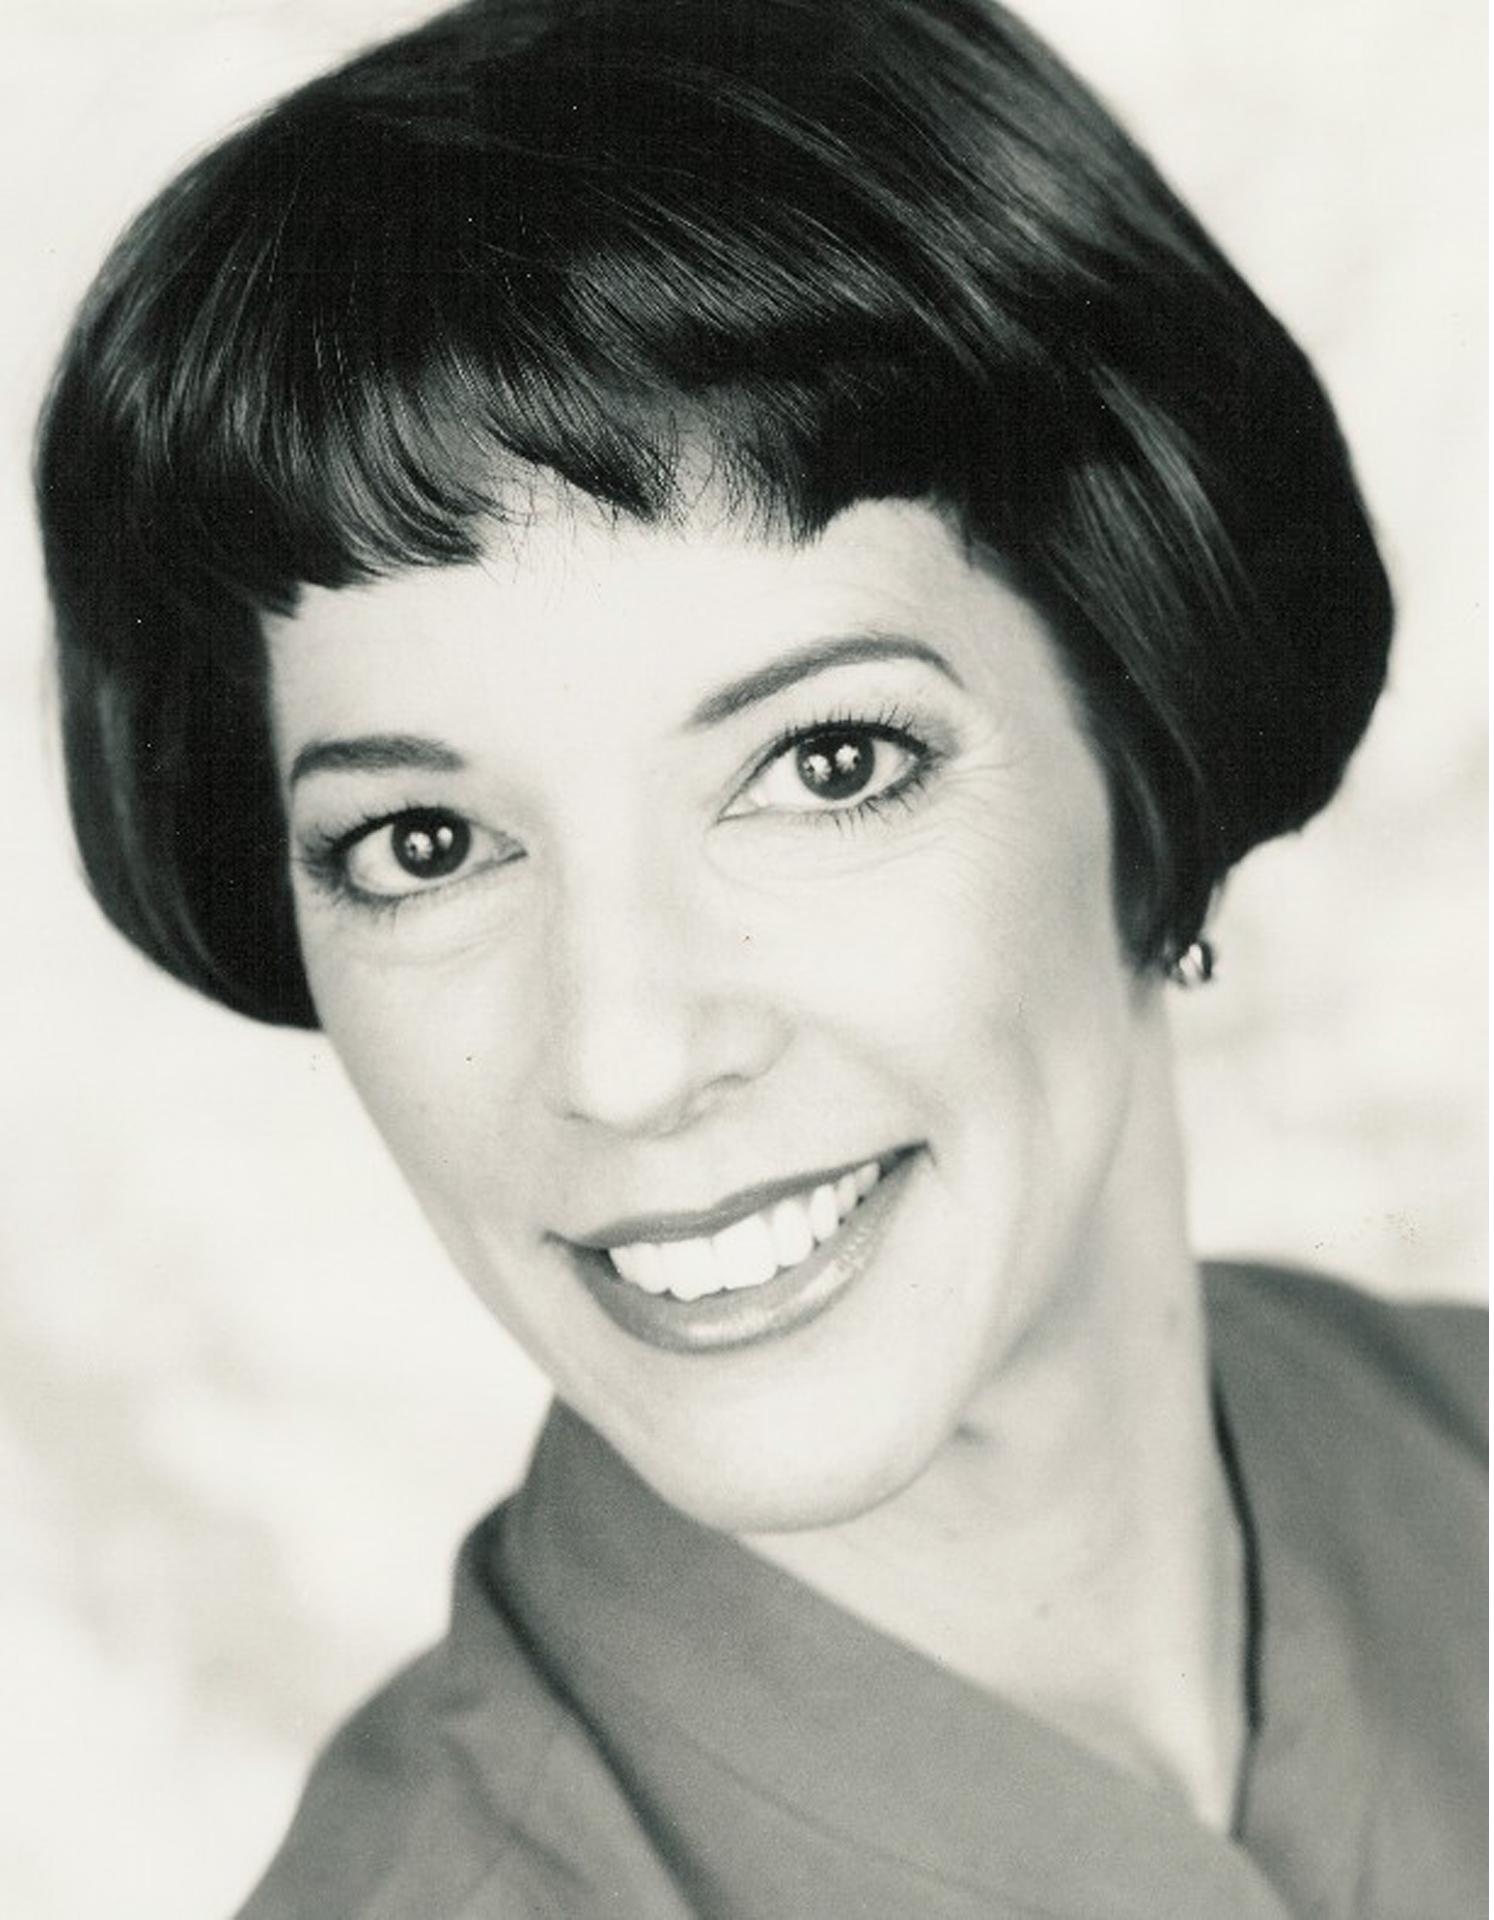 Sharon Decrosta